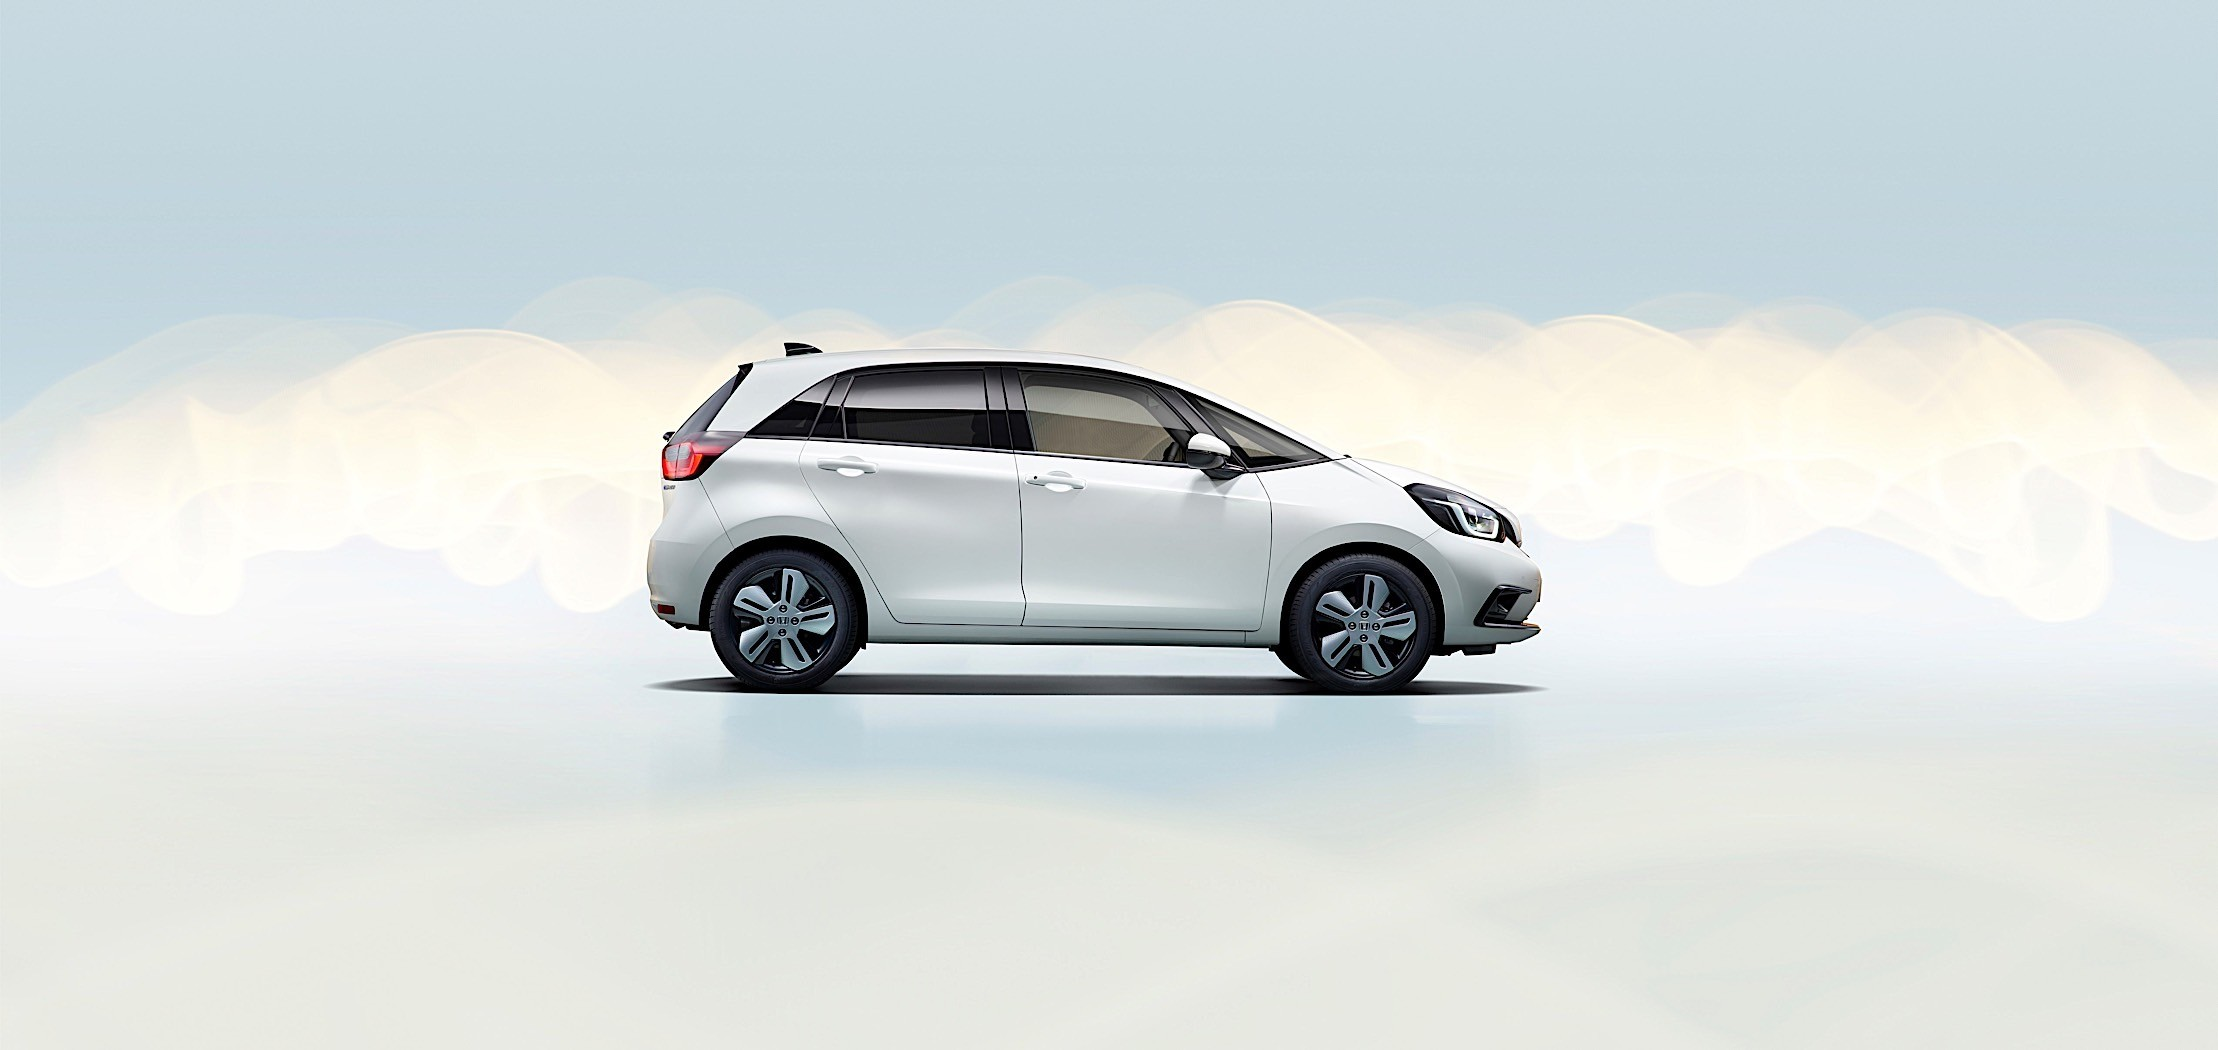 new honda jazz ehev features ev drive mode  autoevolution